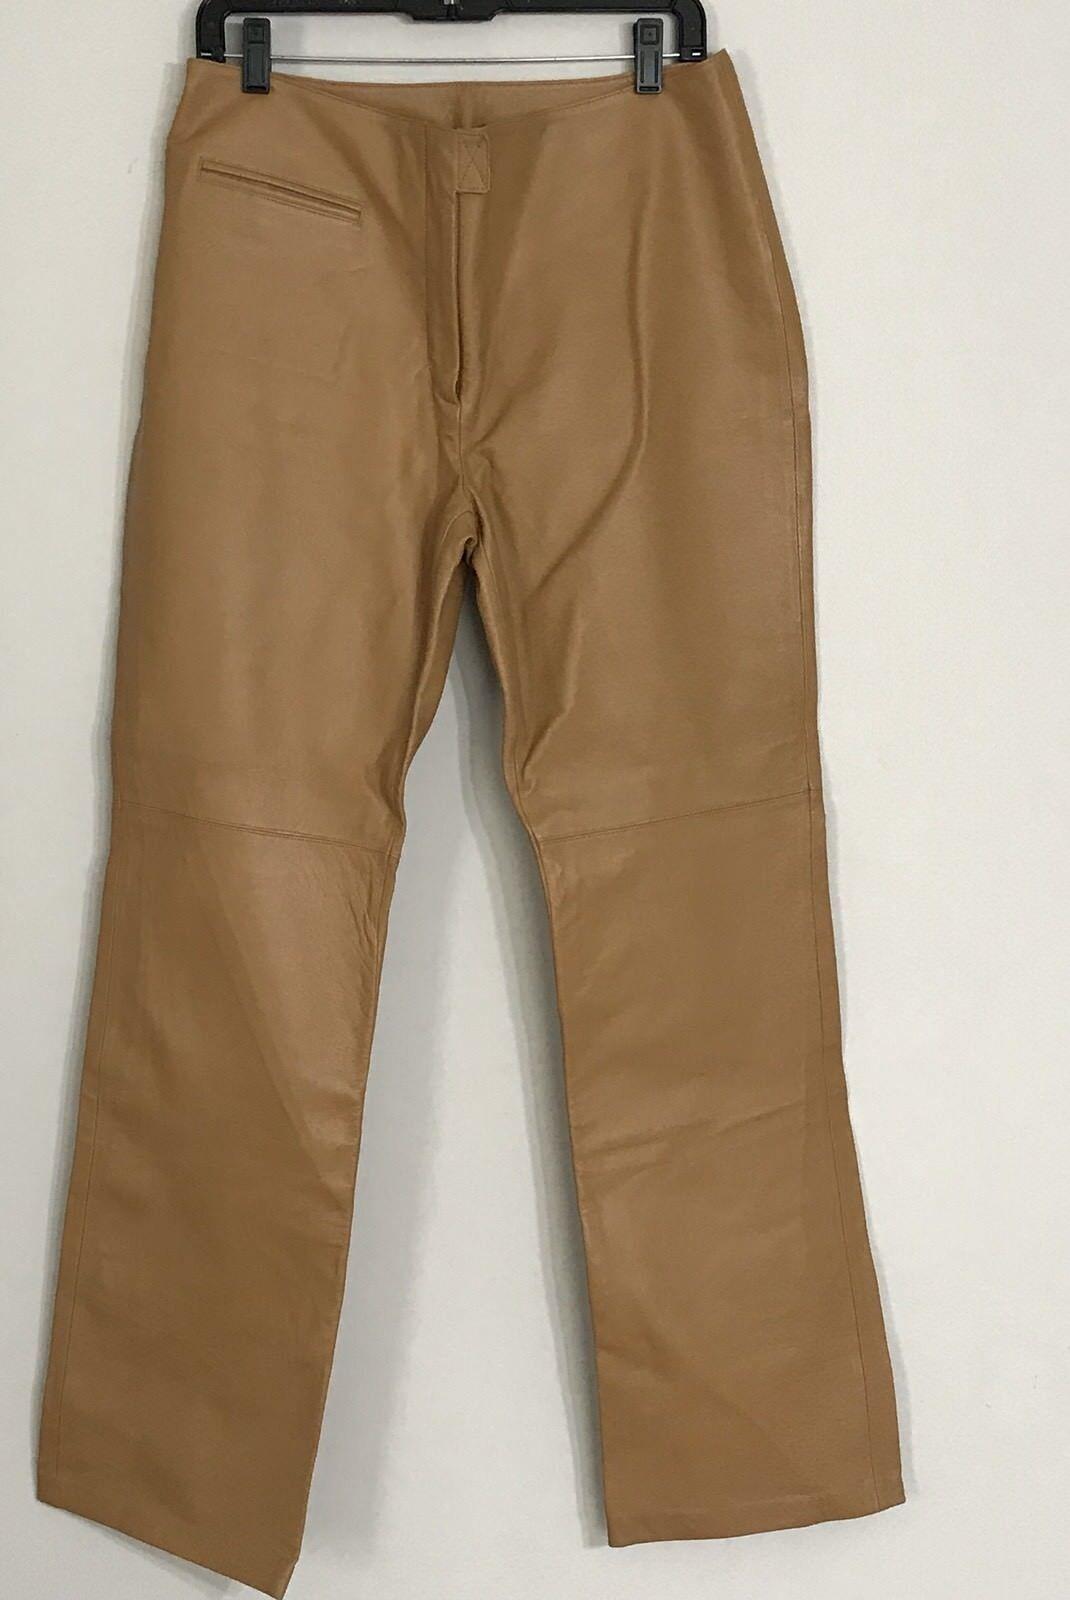 damen Marcia Collection  Skin Tan Leather Pants Größe 12